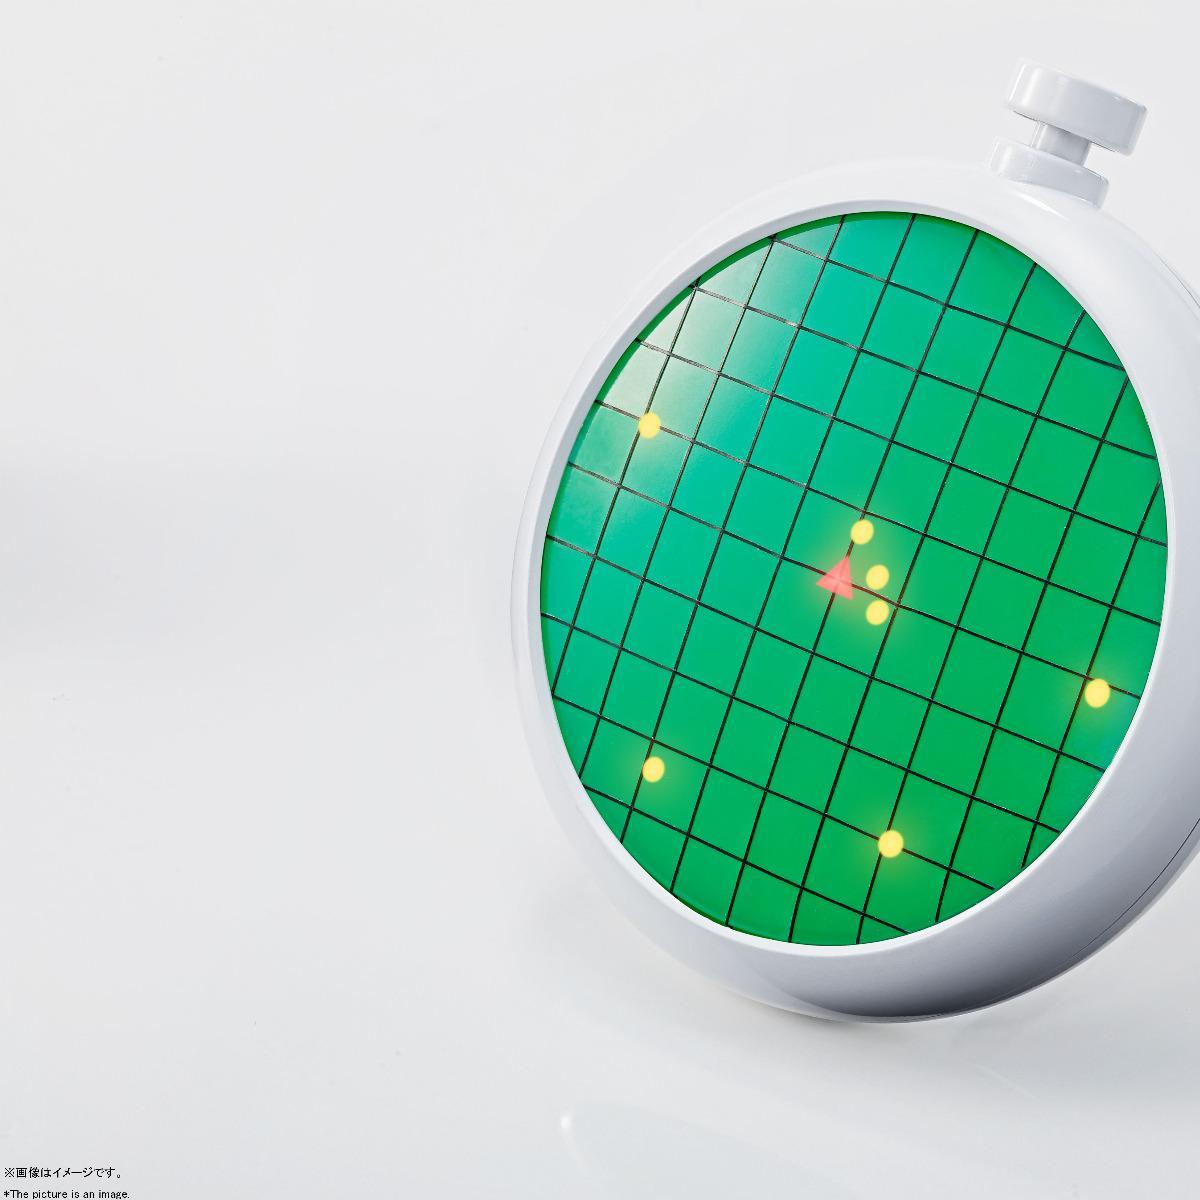 Proplica Dragon Radar